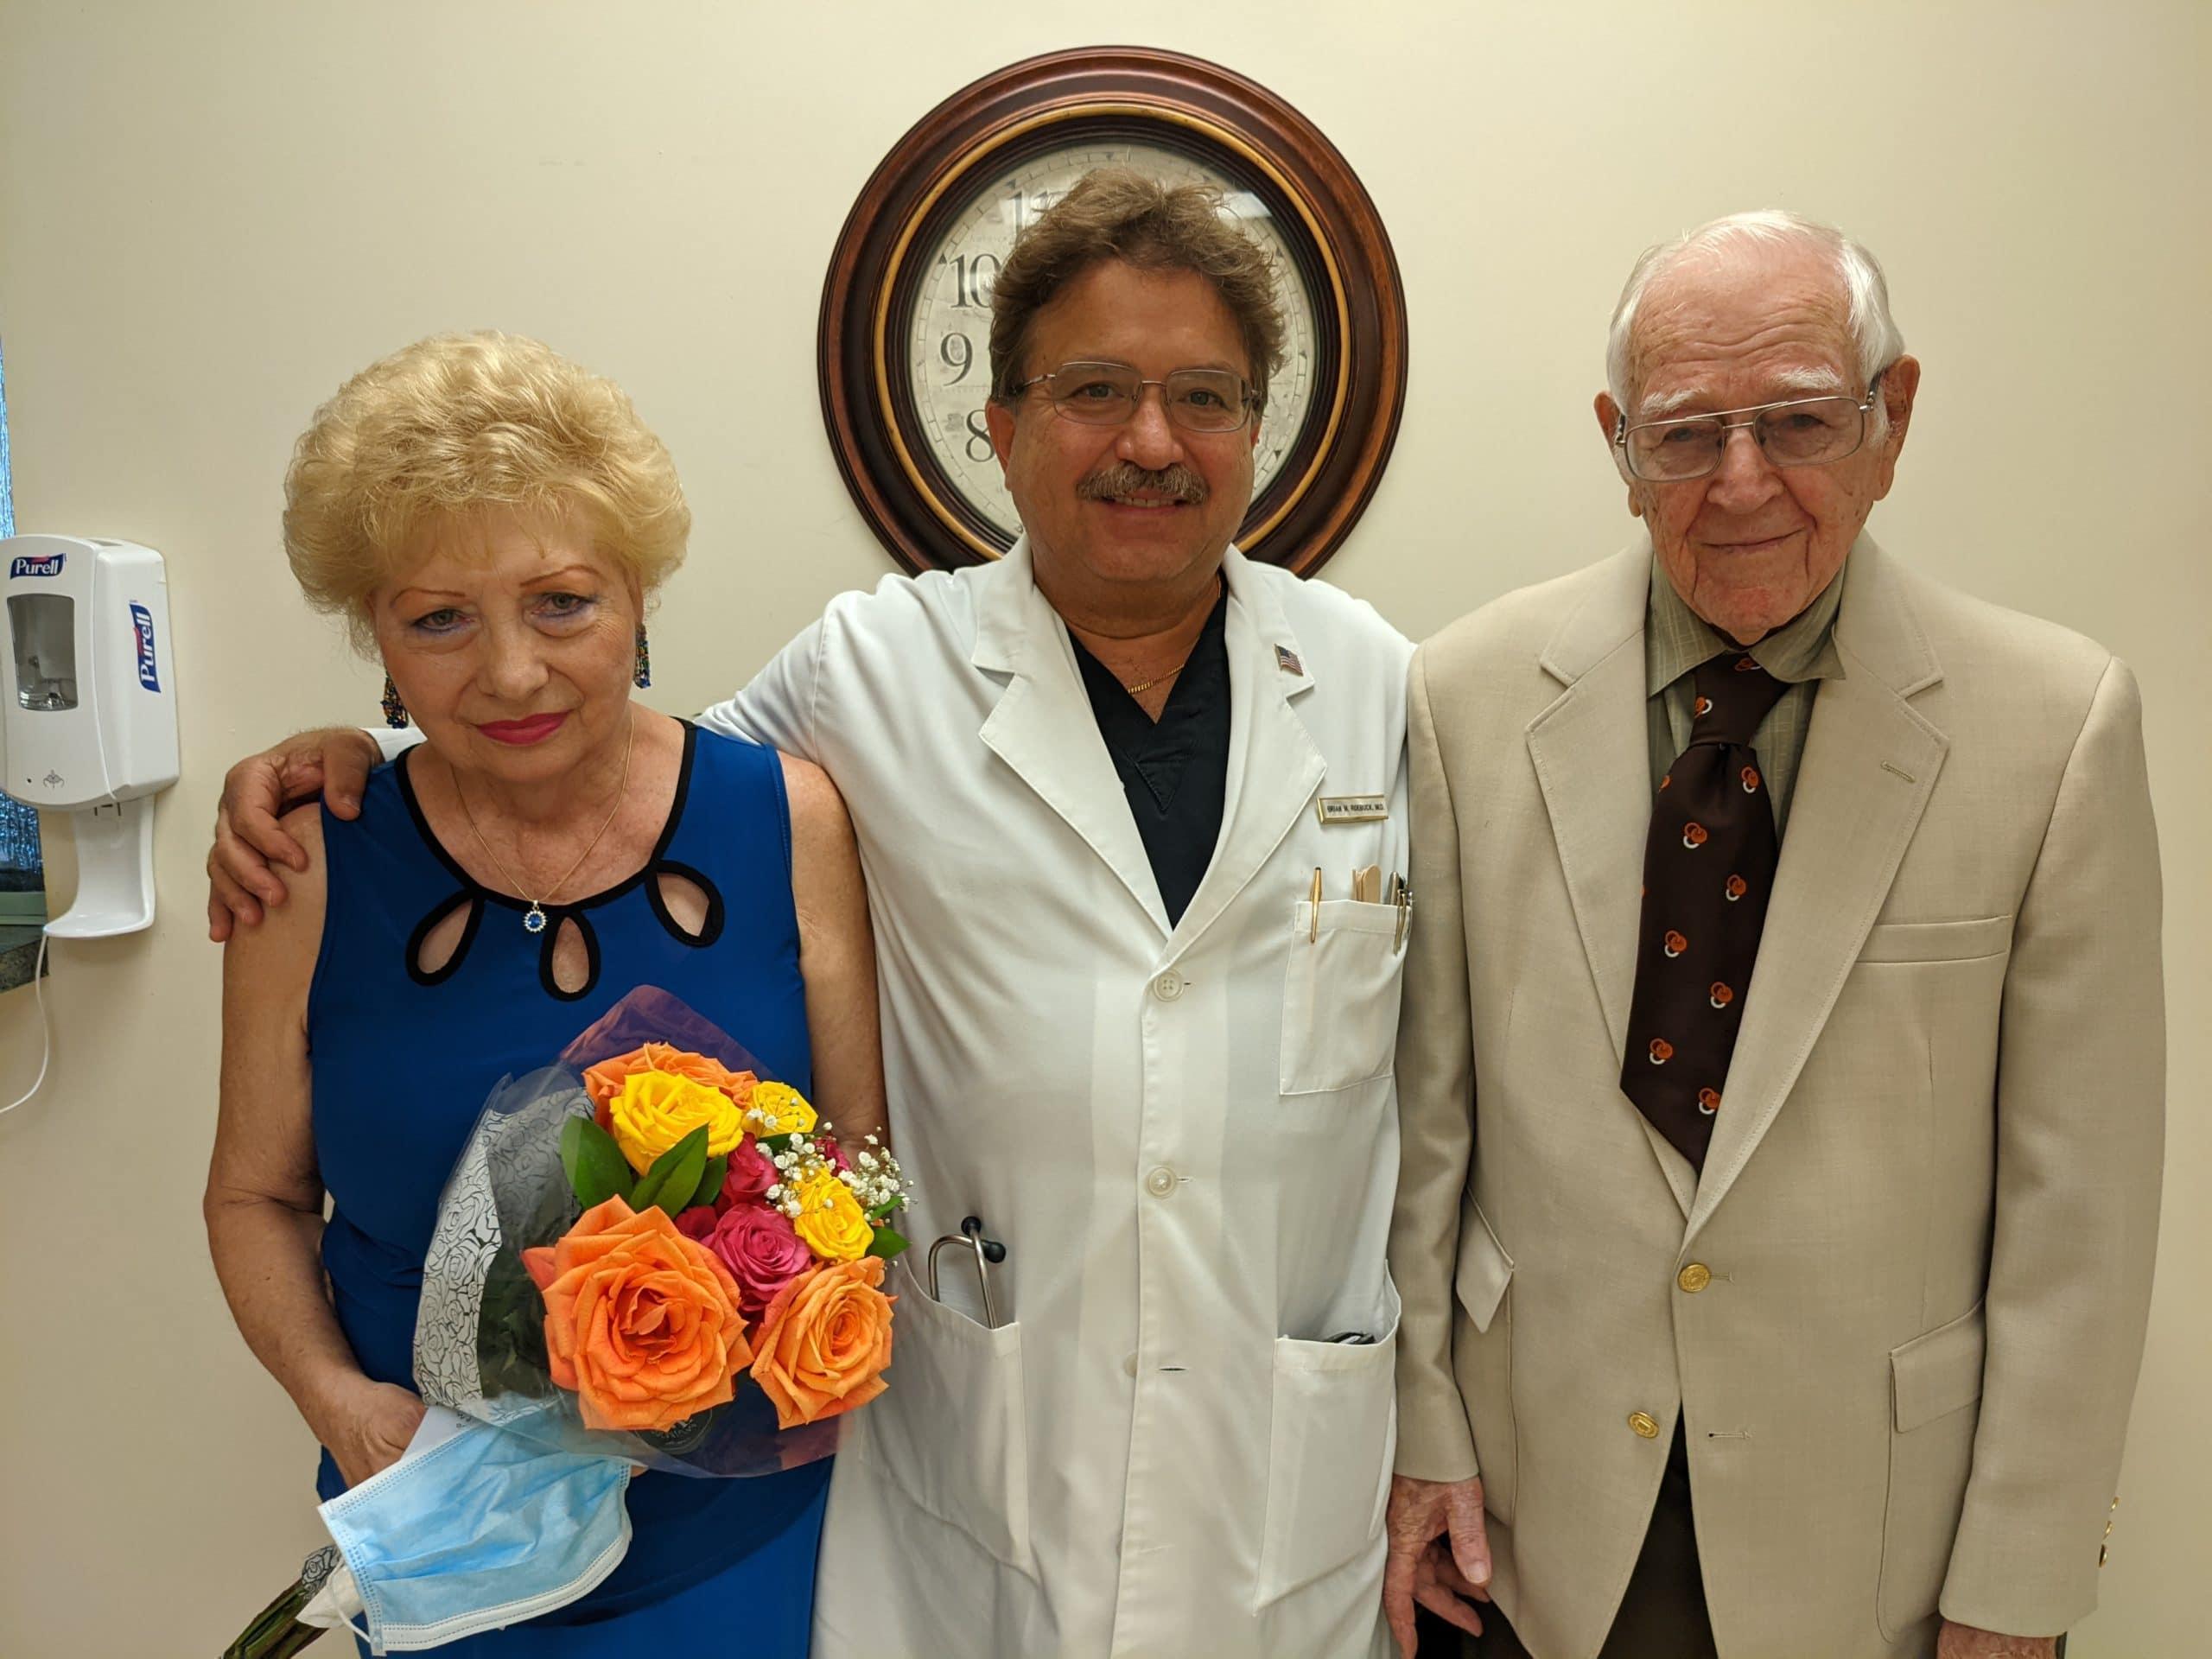 Lila Vogler, Dr. Brian Roebuck and Emil Vogler